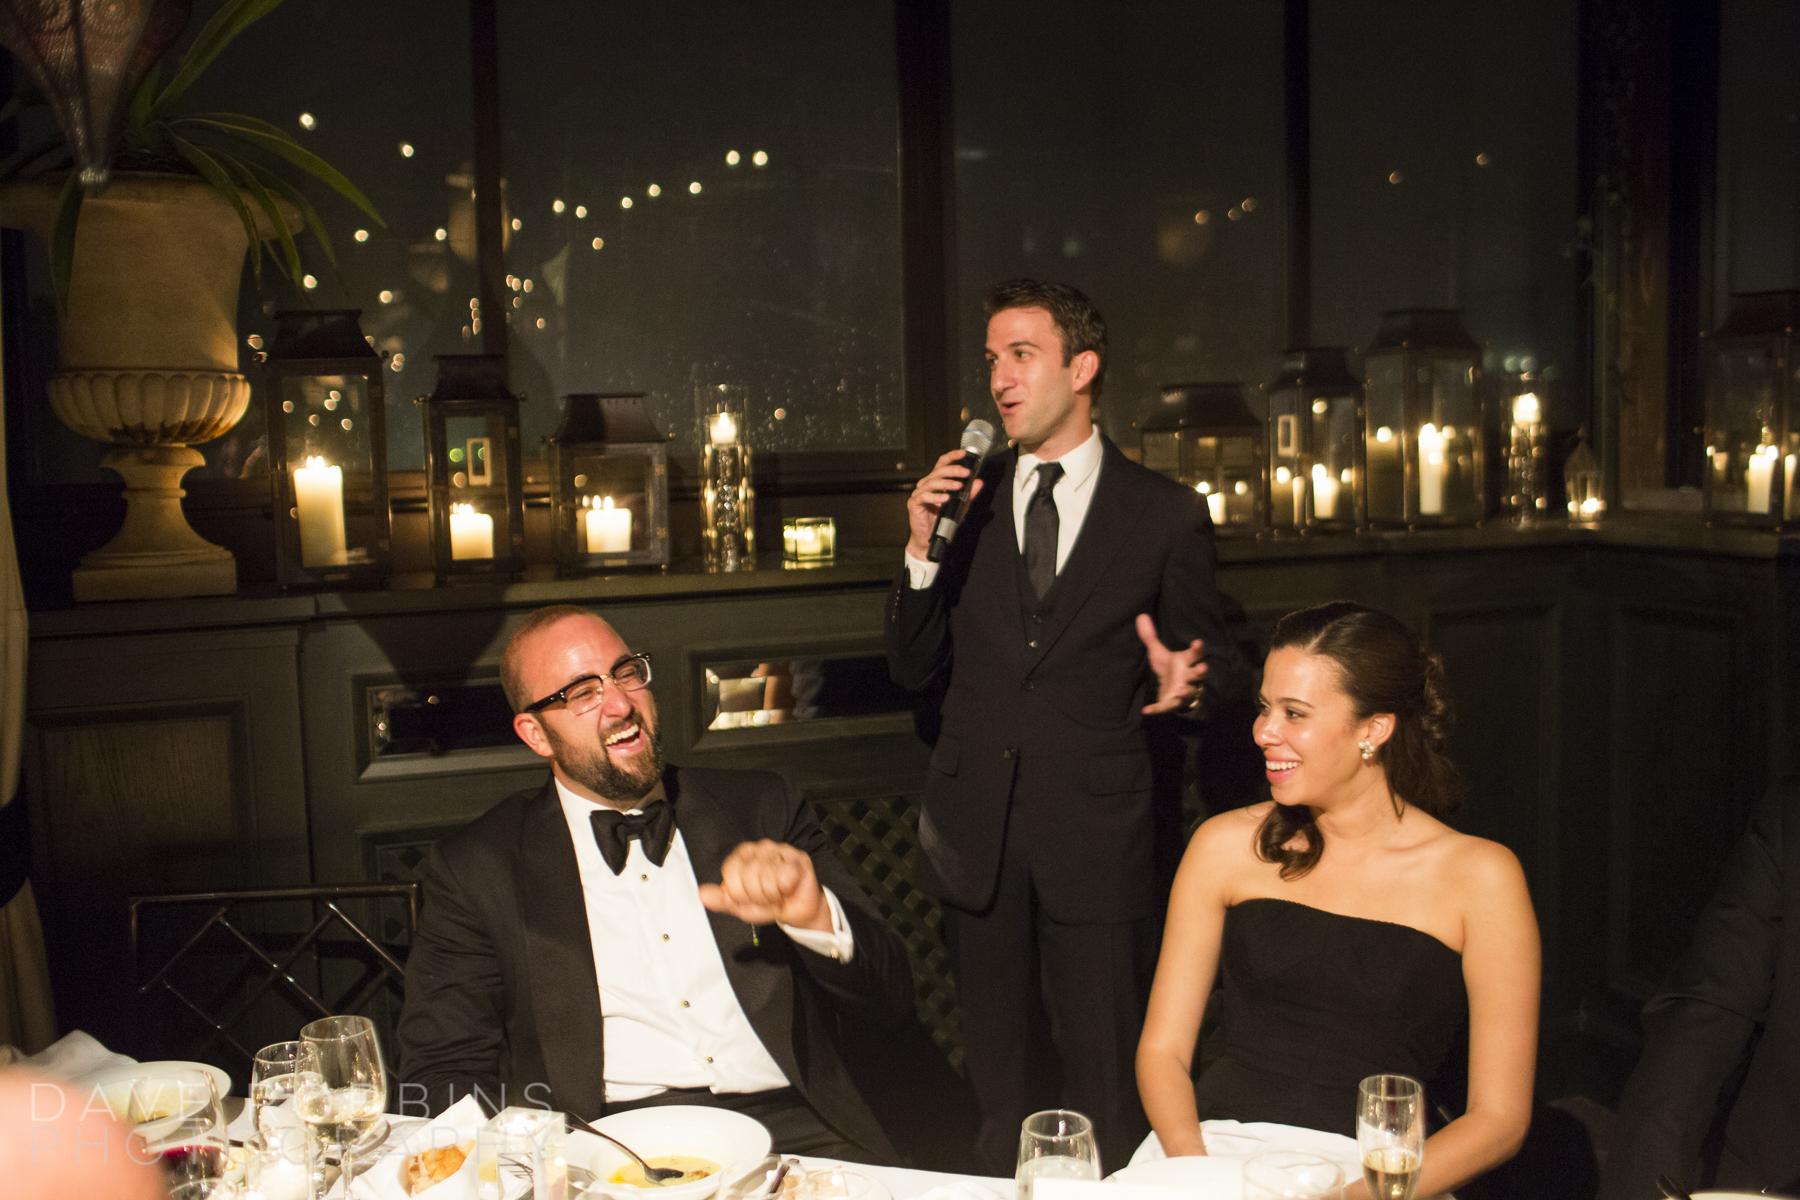 GRAMERCY PARK HOTEL WEDDING - 000058.JPG